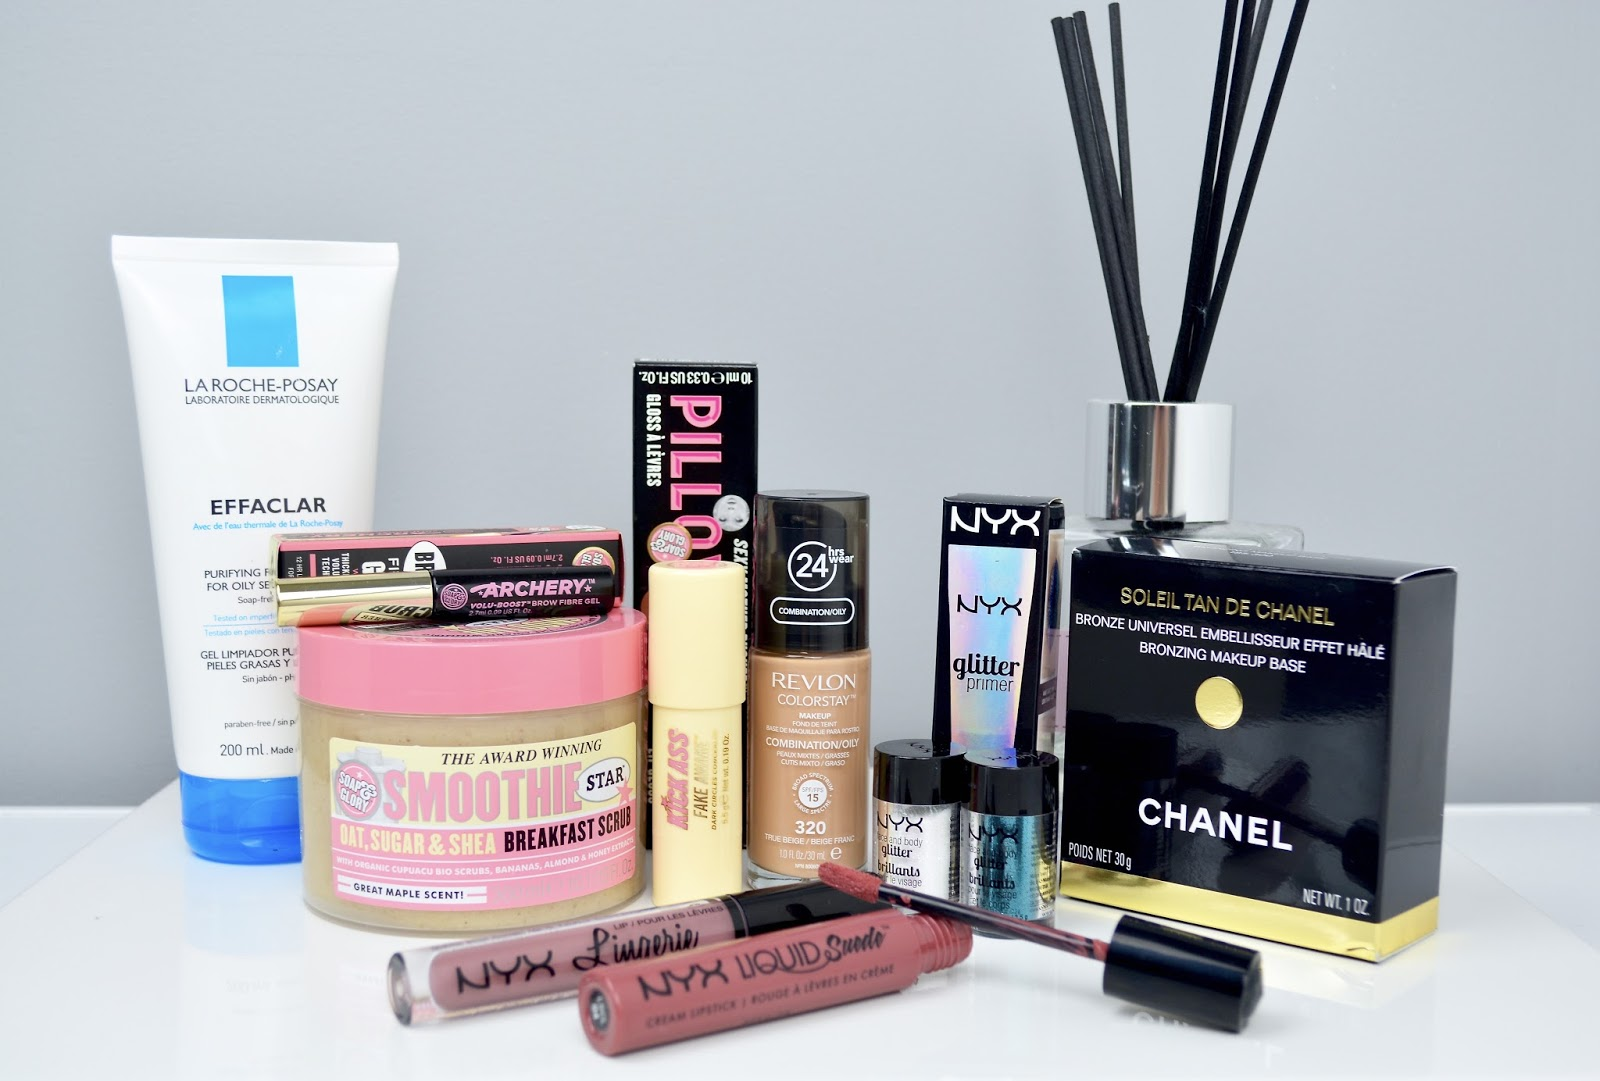 Makeup, Boots Haul, Beauty Haul, NYX, Chanel, Soap and Glory, Revlon Color Stay Foundation, NYX Cosmetics, Lipstick, Lip Gloss, Beauty Blogger, Glitter, NYX Face and Body Glitter